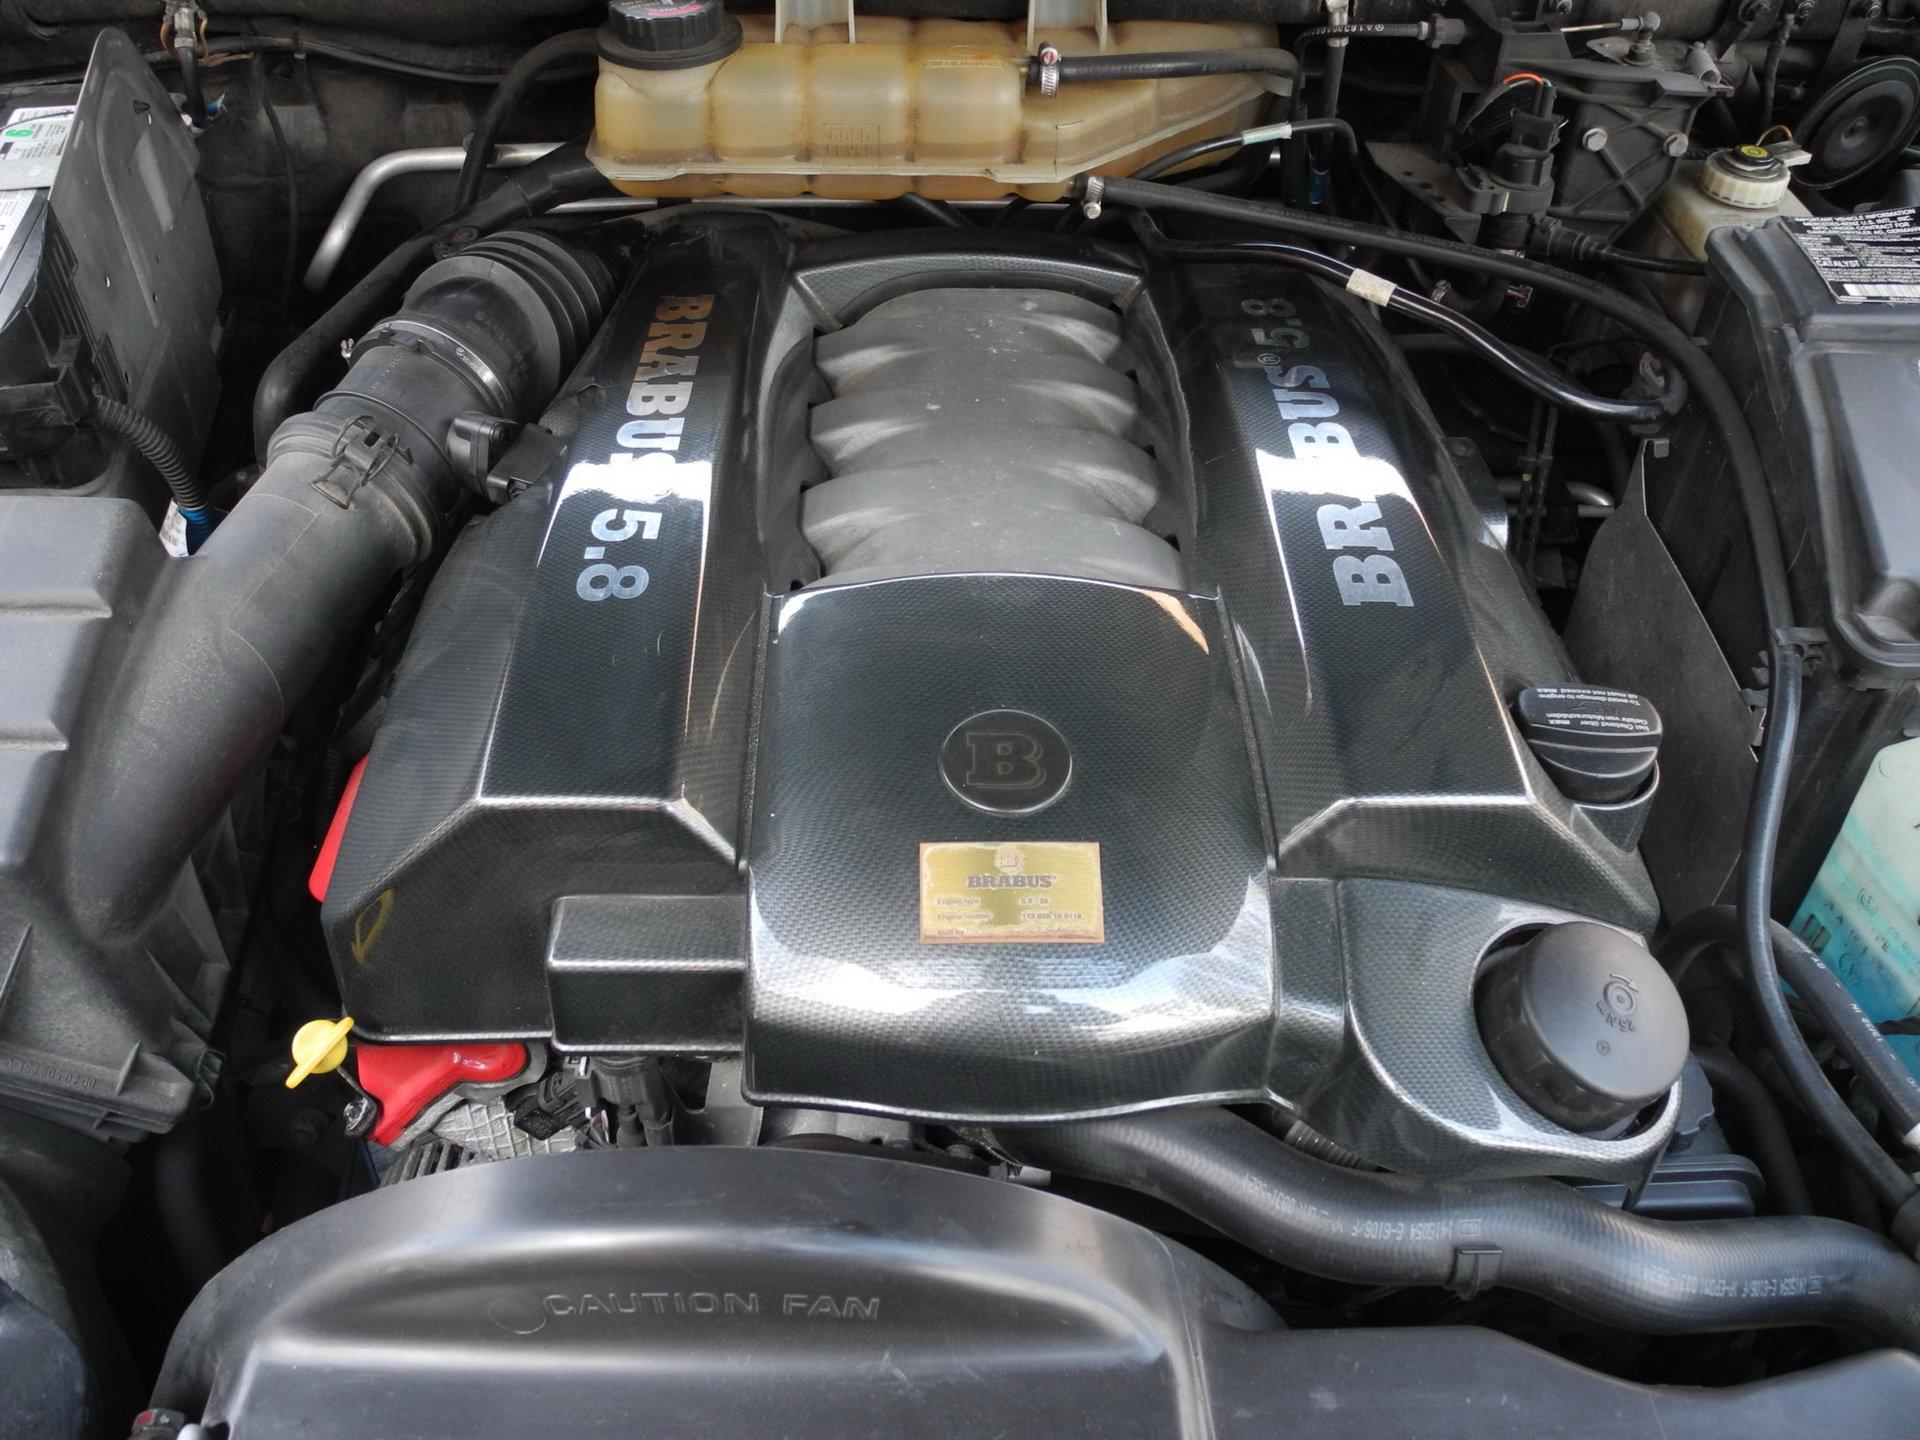 Редчайший Mercedes ML Brabus продают по цене Audi на еврономерах